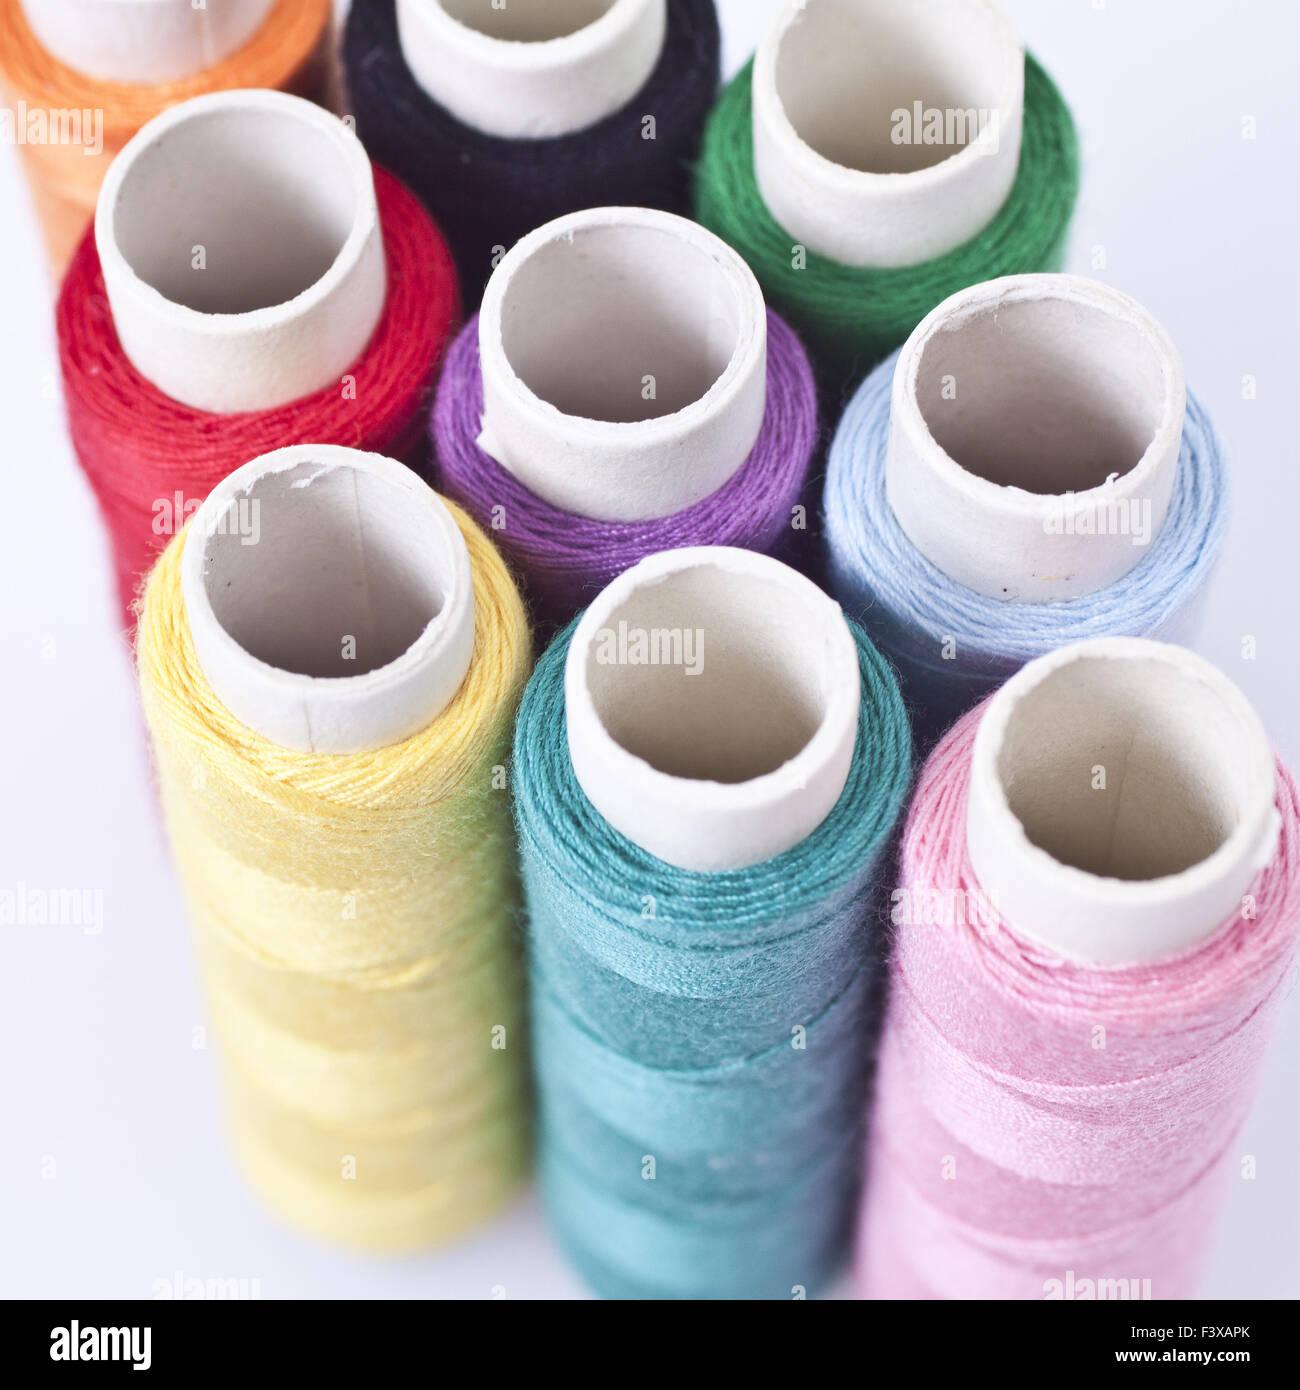 Yarn Reel Stock Photos & Yarn Reel Stock Images - Alamy